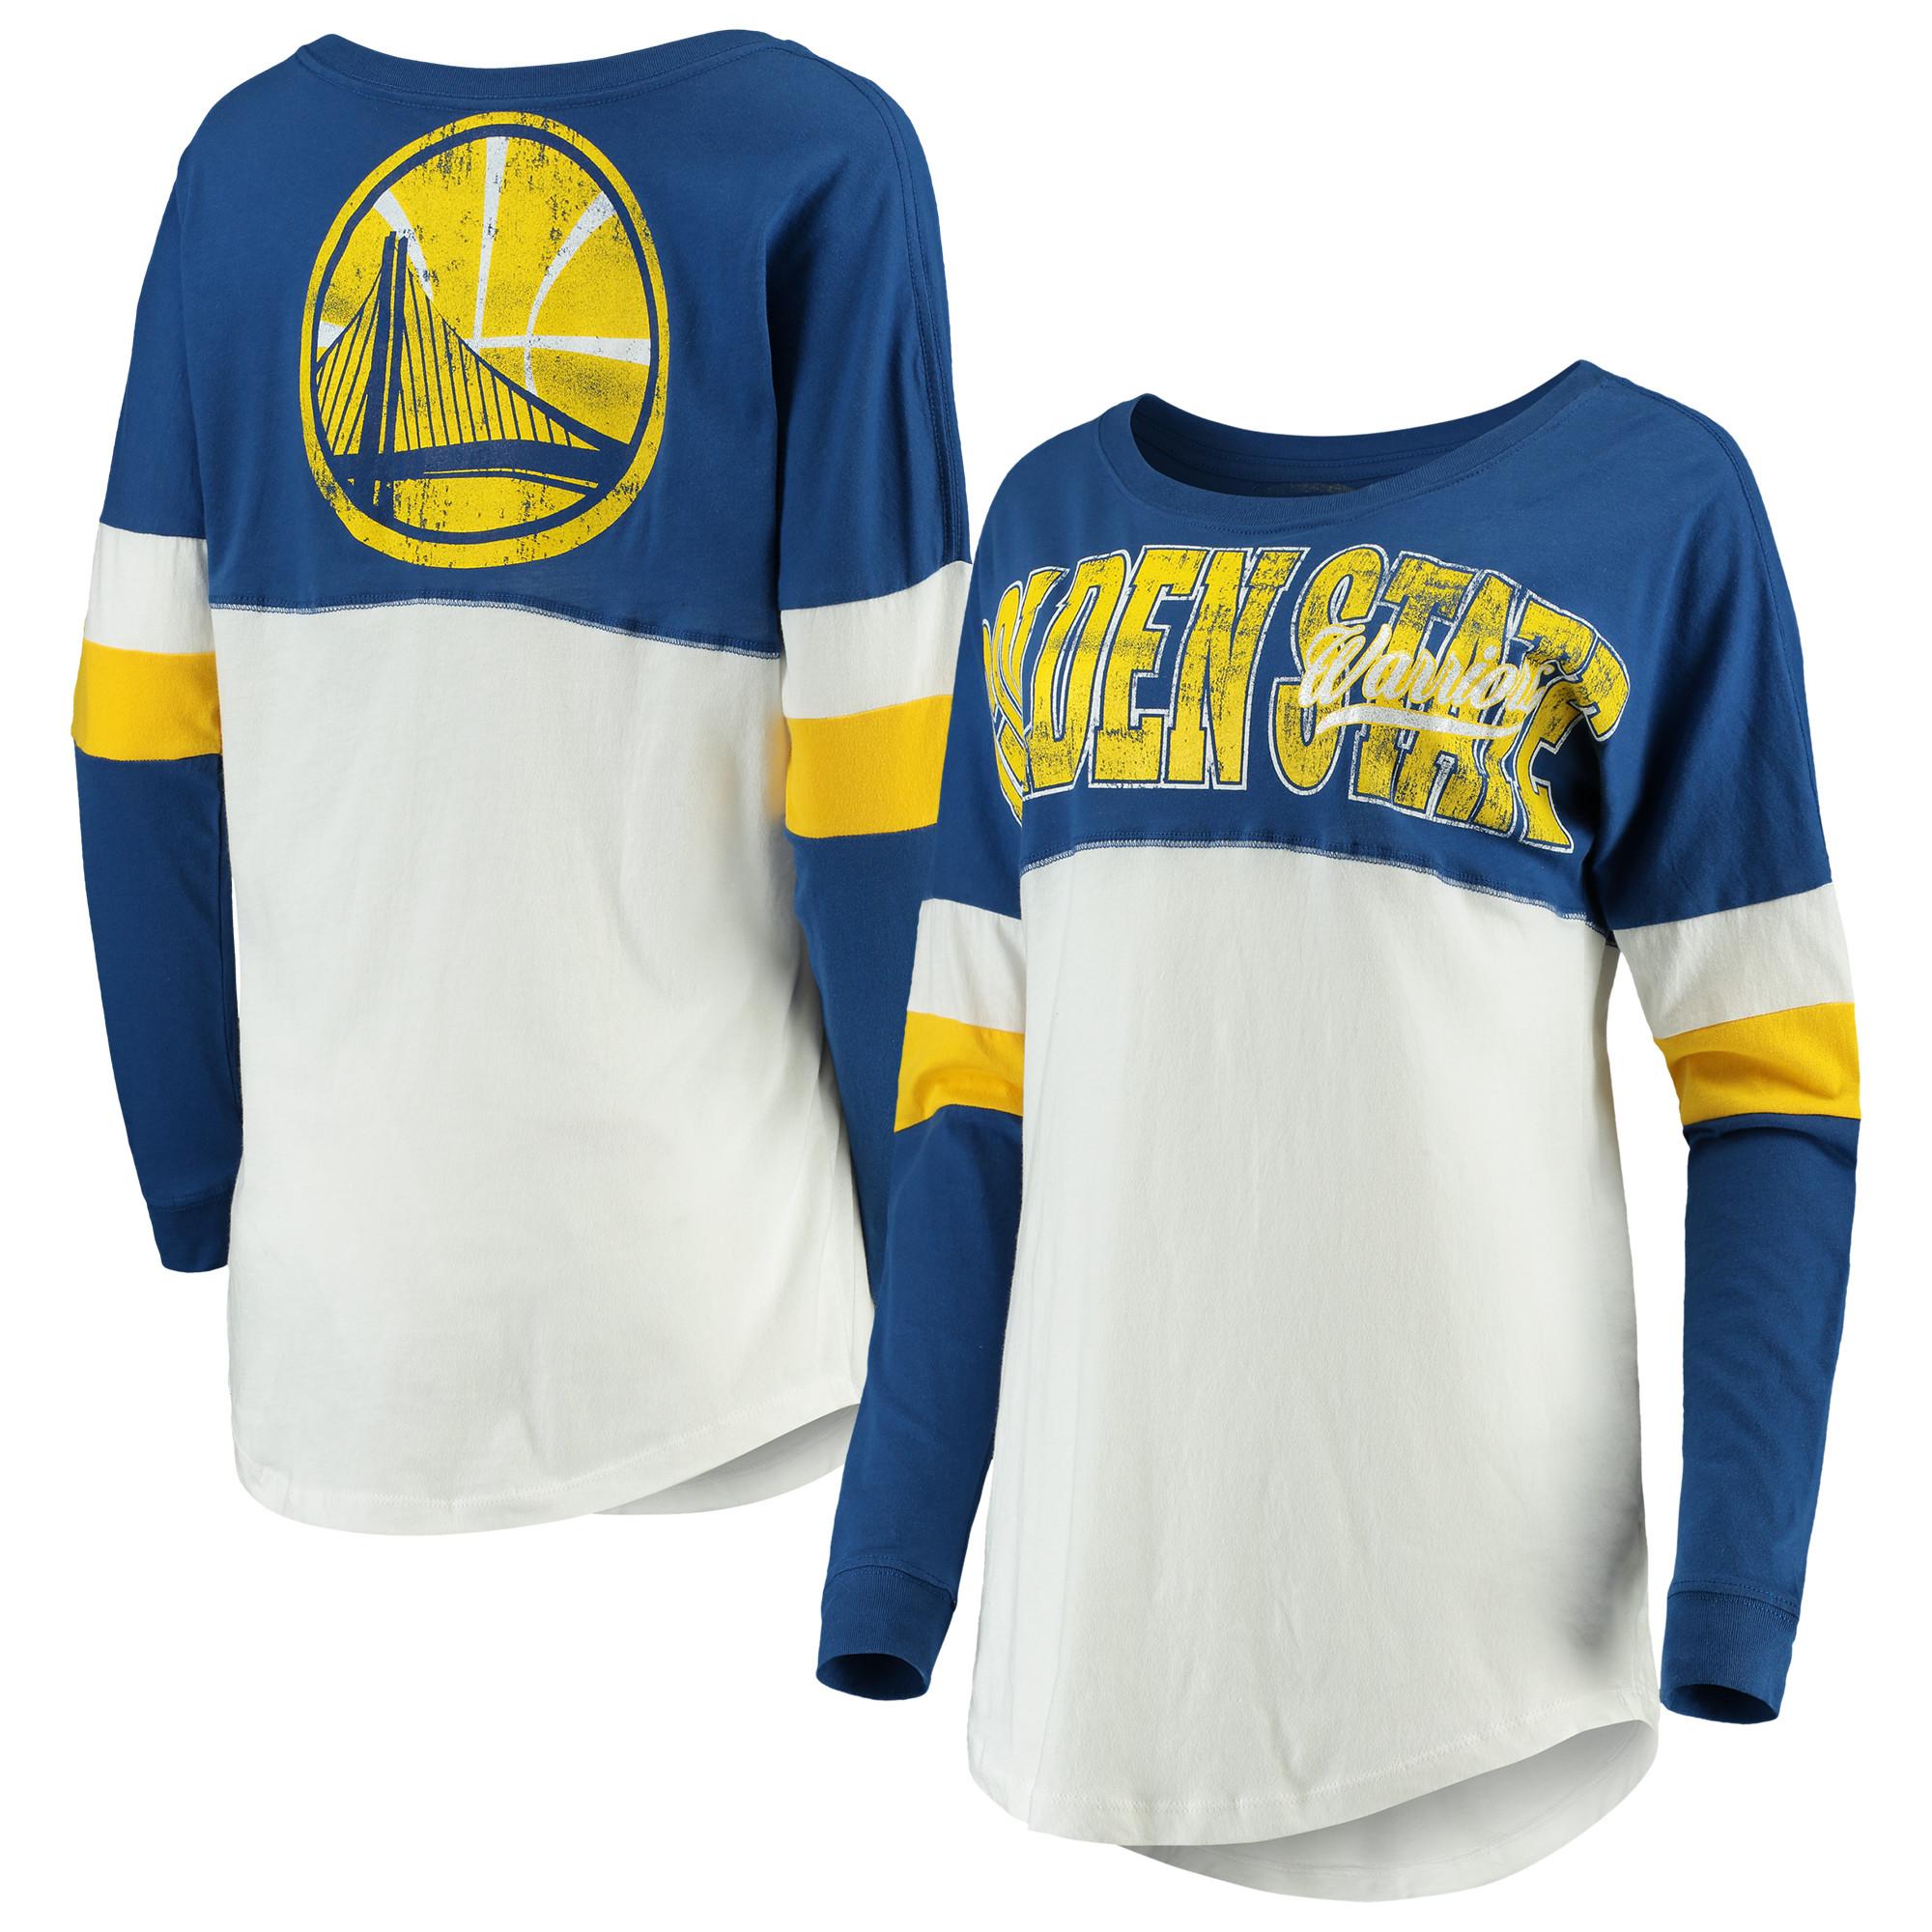 Golden State Warriors New Era Women's Baby Jersey Contrast Long Sleeve Crew Neck T-Shirt - White/Royal